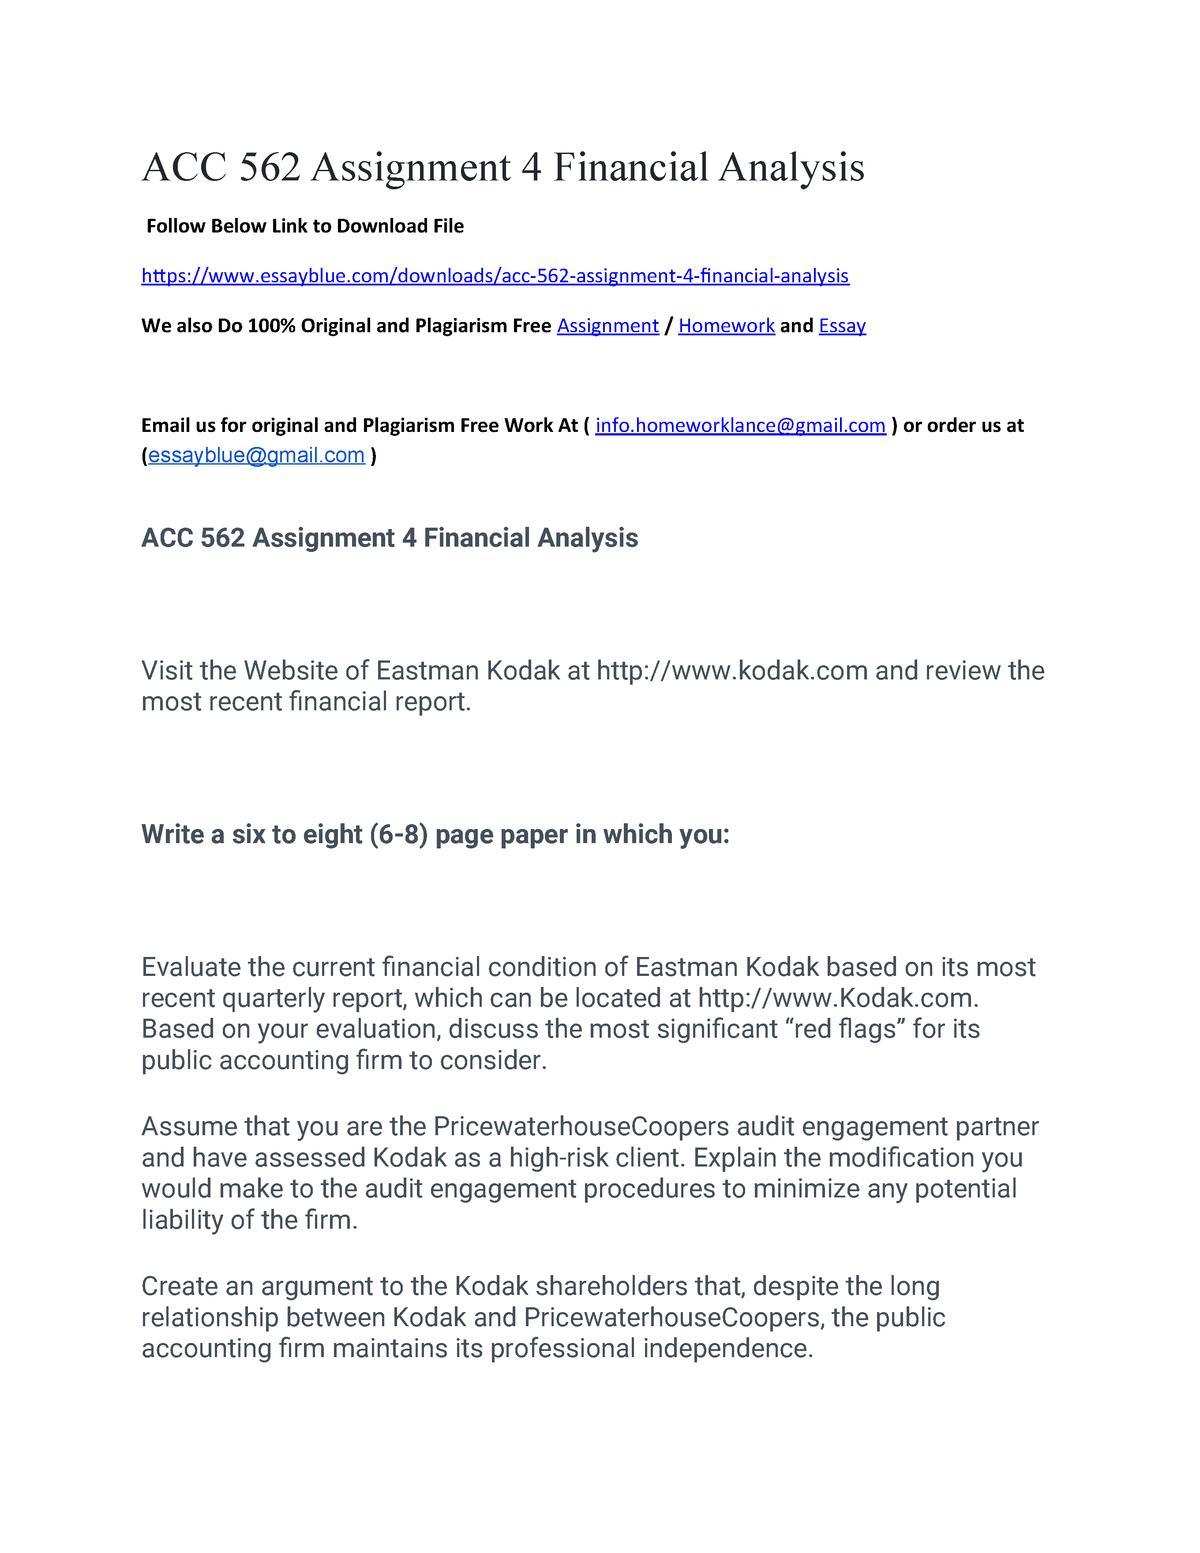 ACC 562 Assignment 4 Financial Analysis - - Ox - StuDocu